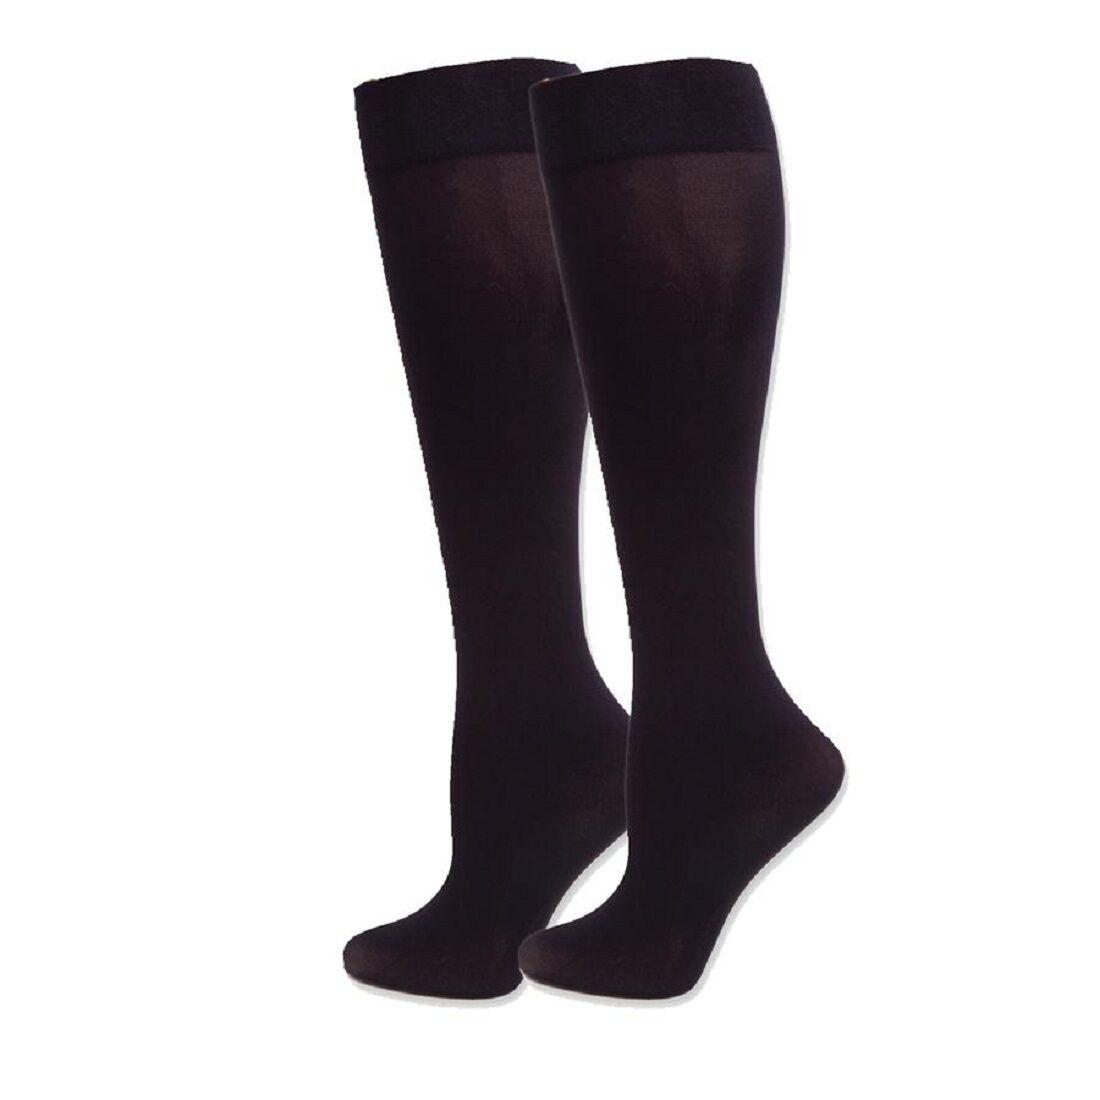 Bell Women/'s Microfiber Trouser Socks One Size K 32026